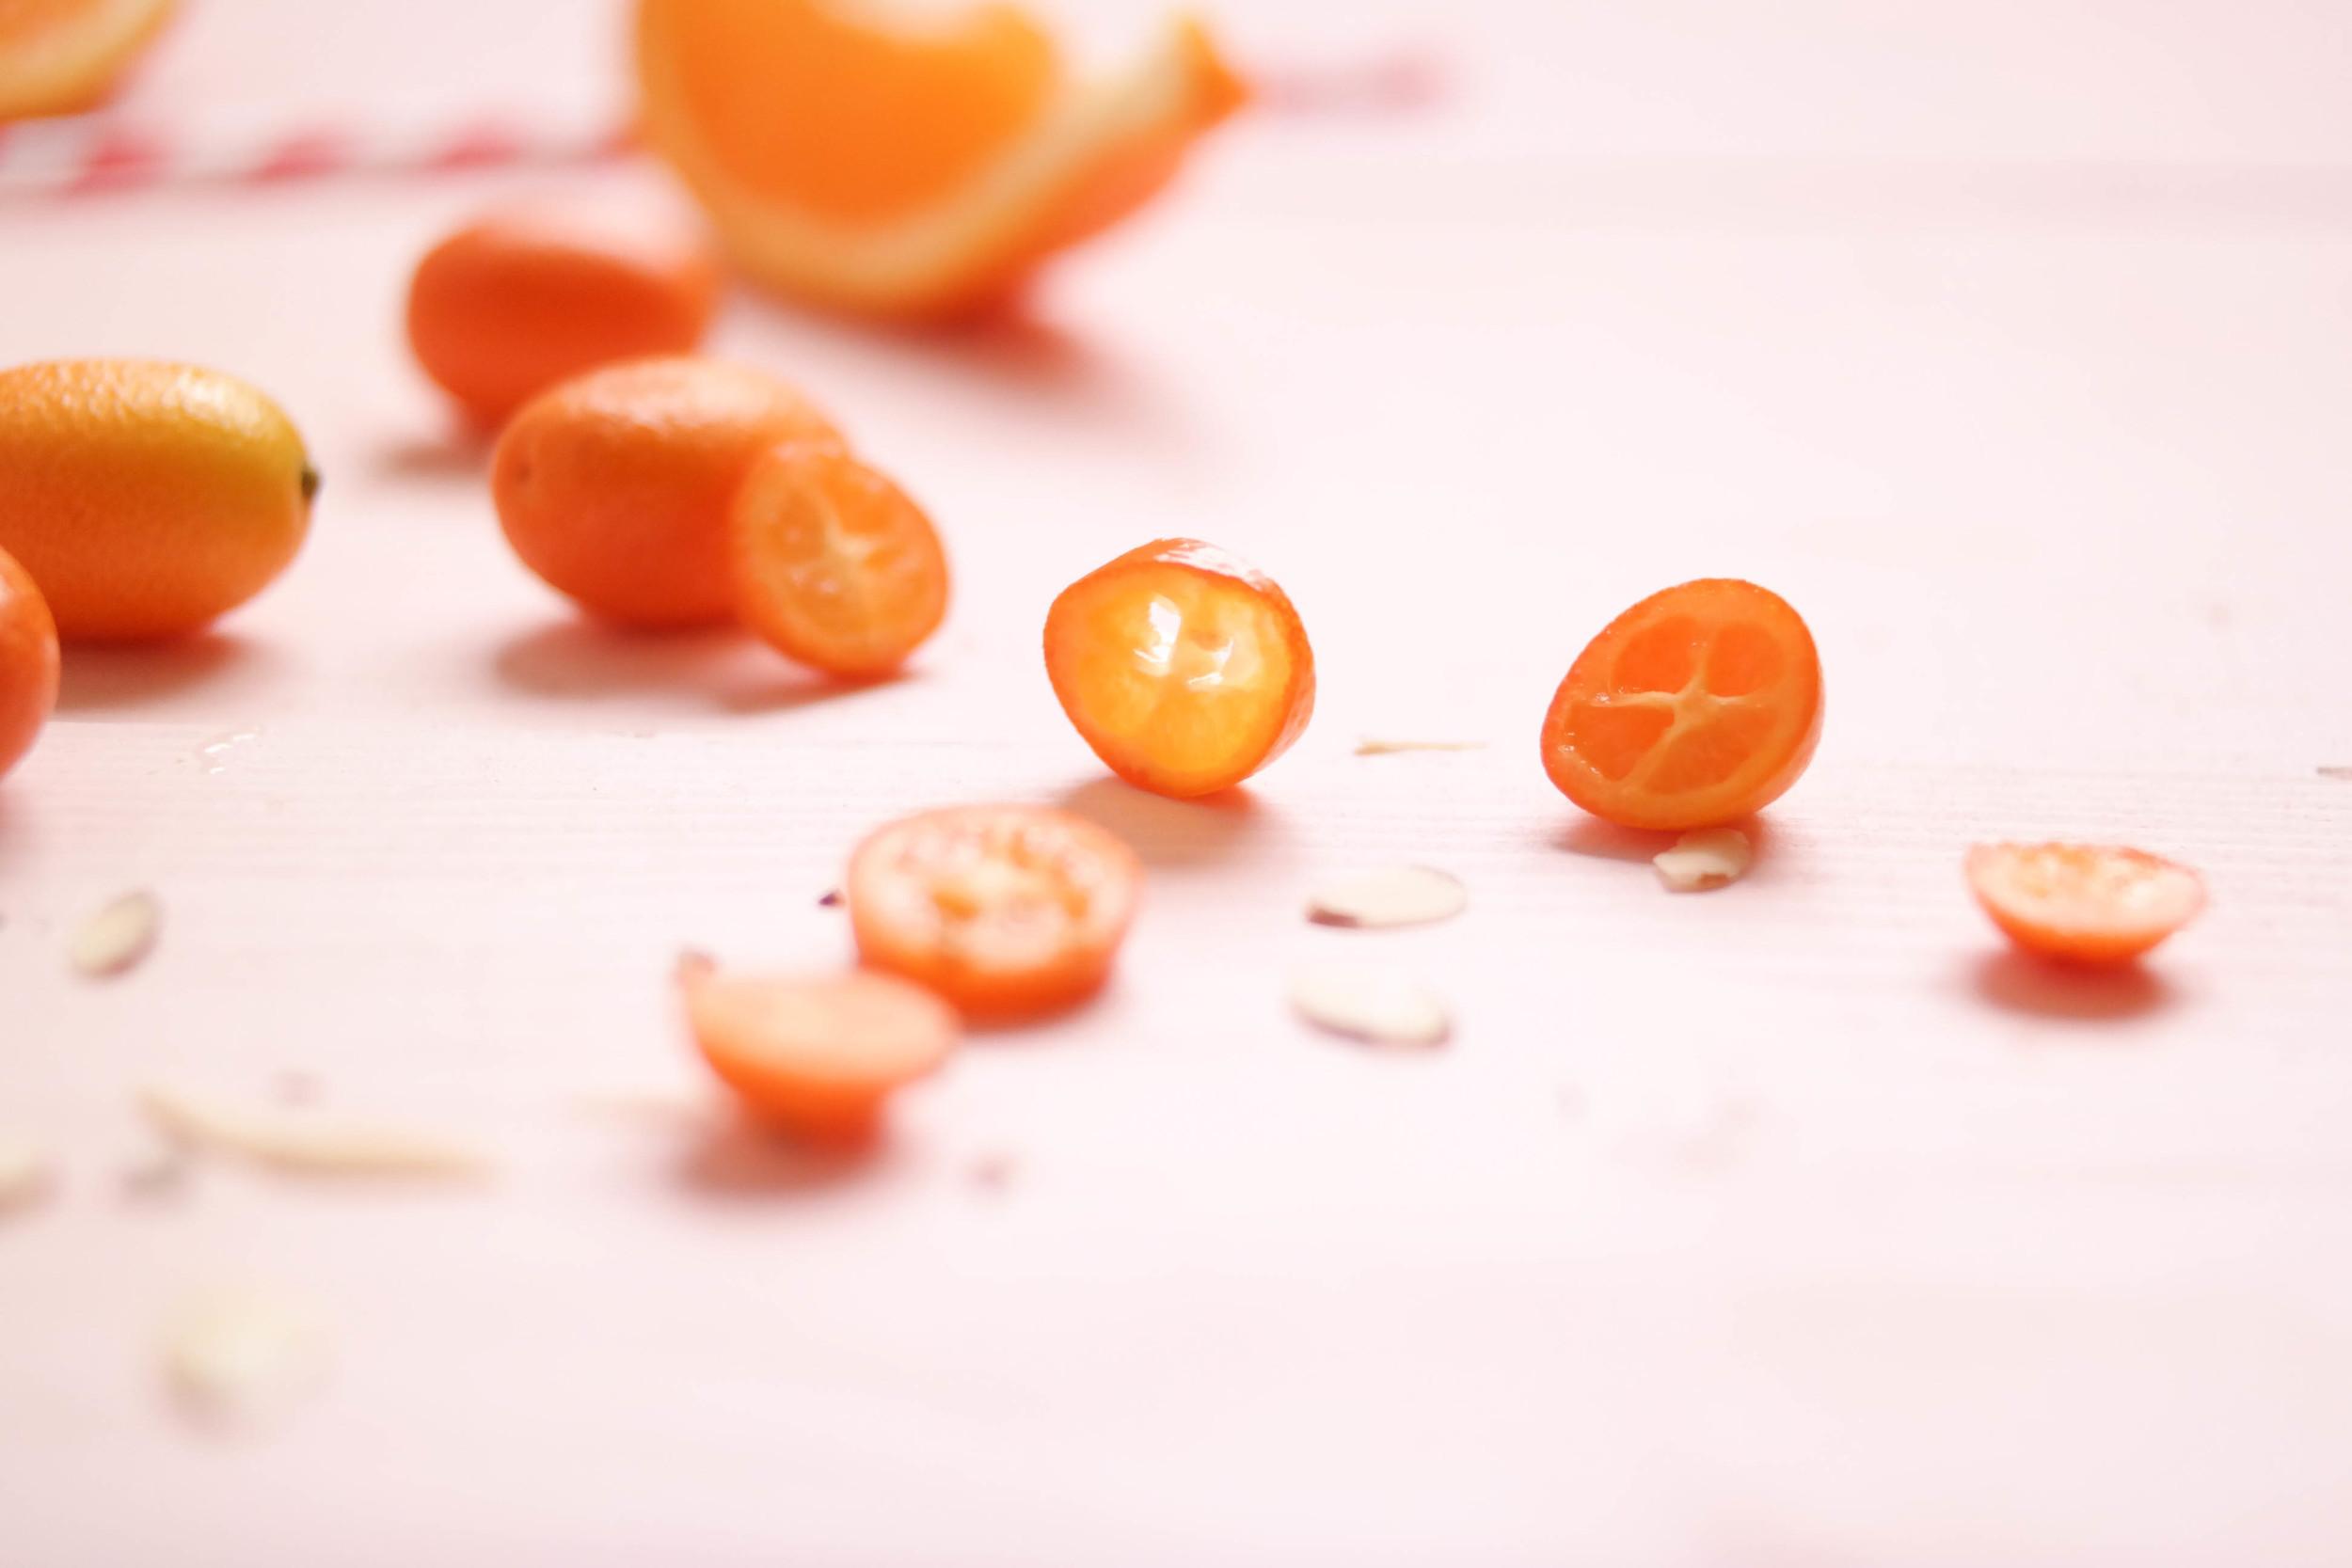 2-Orange-and-Peach-Smoothie | www.8thandlake.com